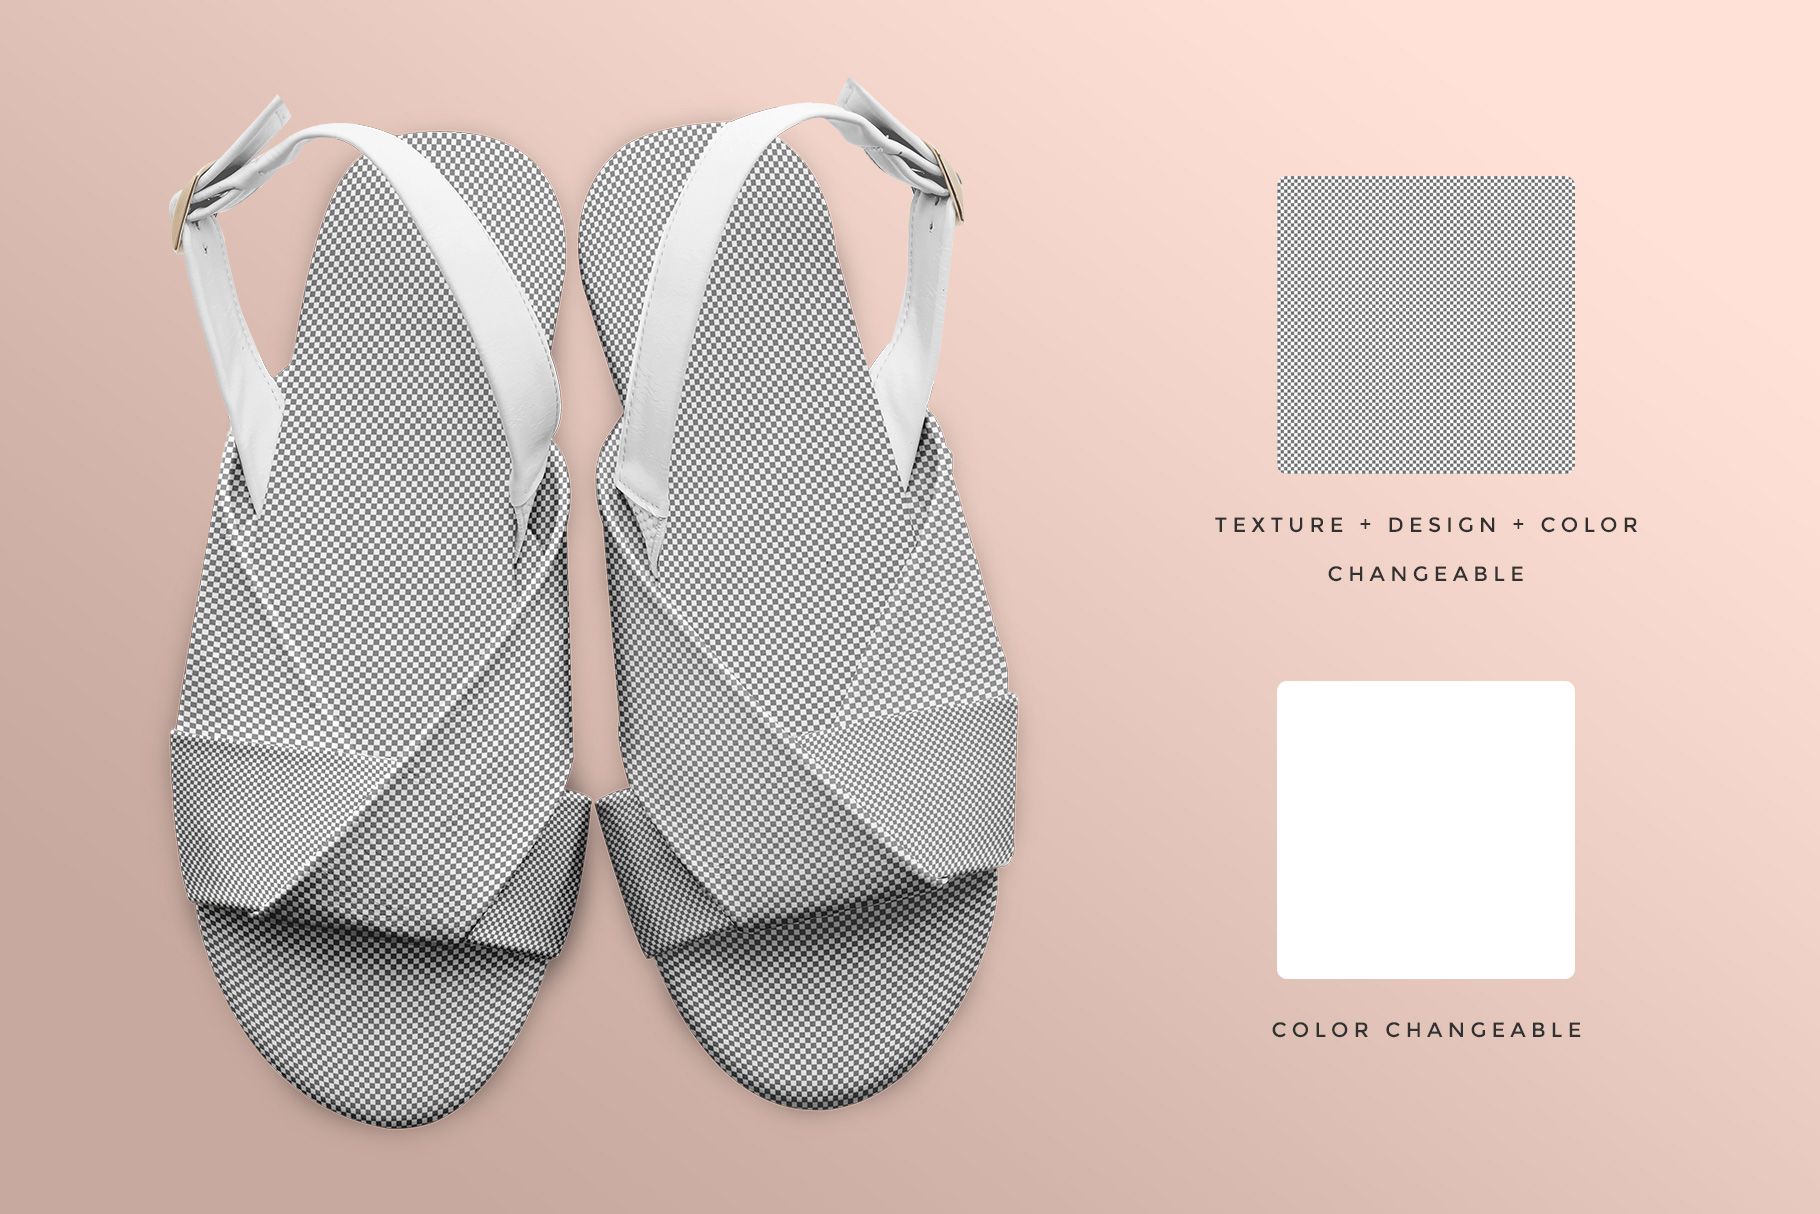 editability of the women's slingback sandal mockup